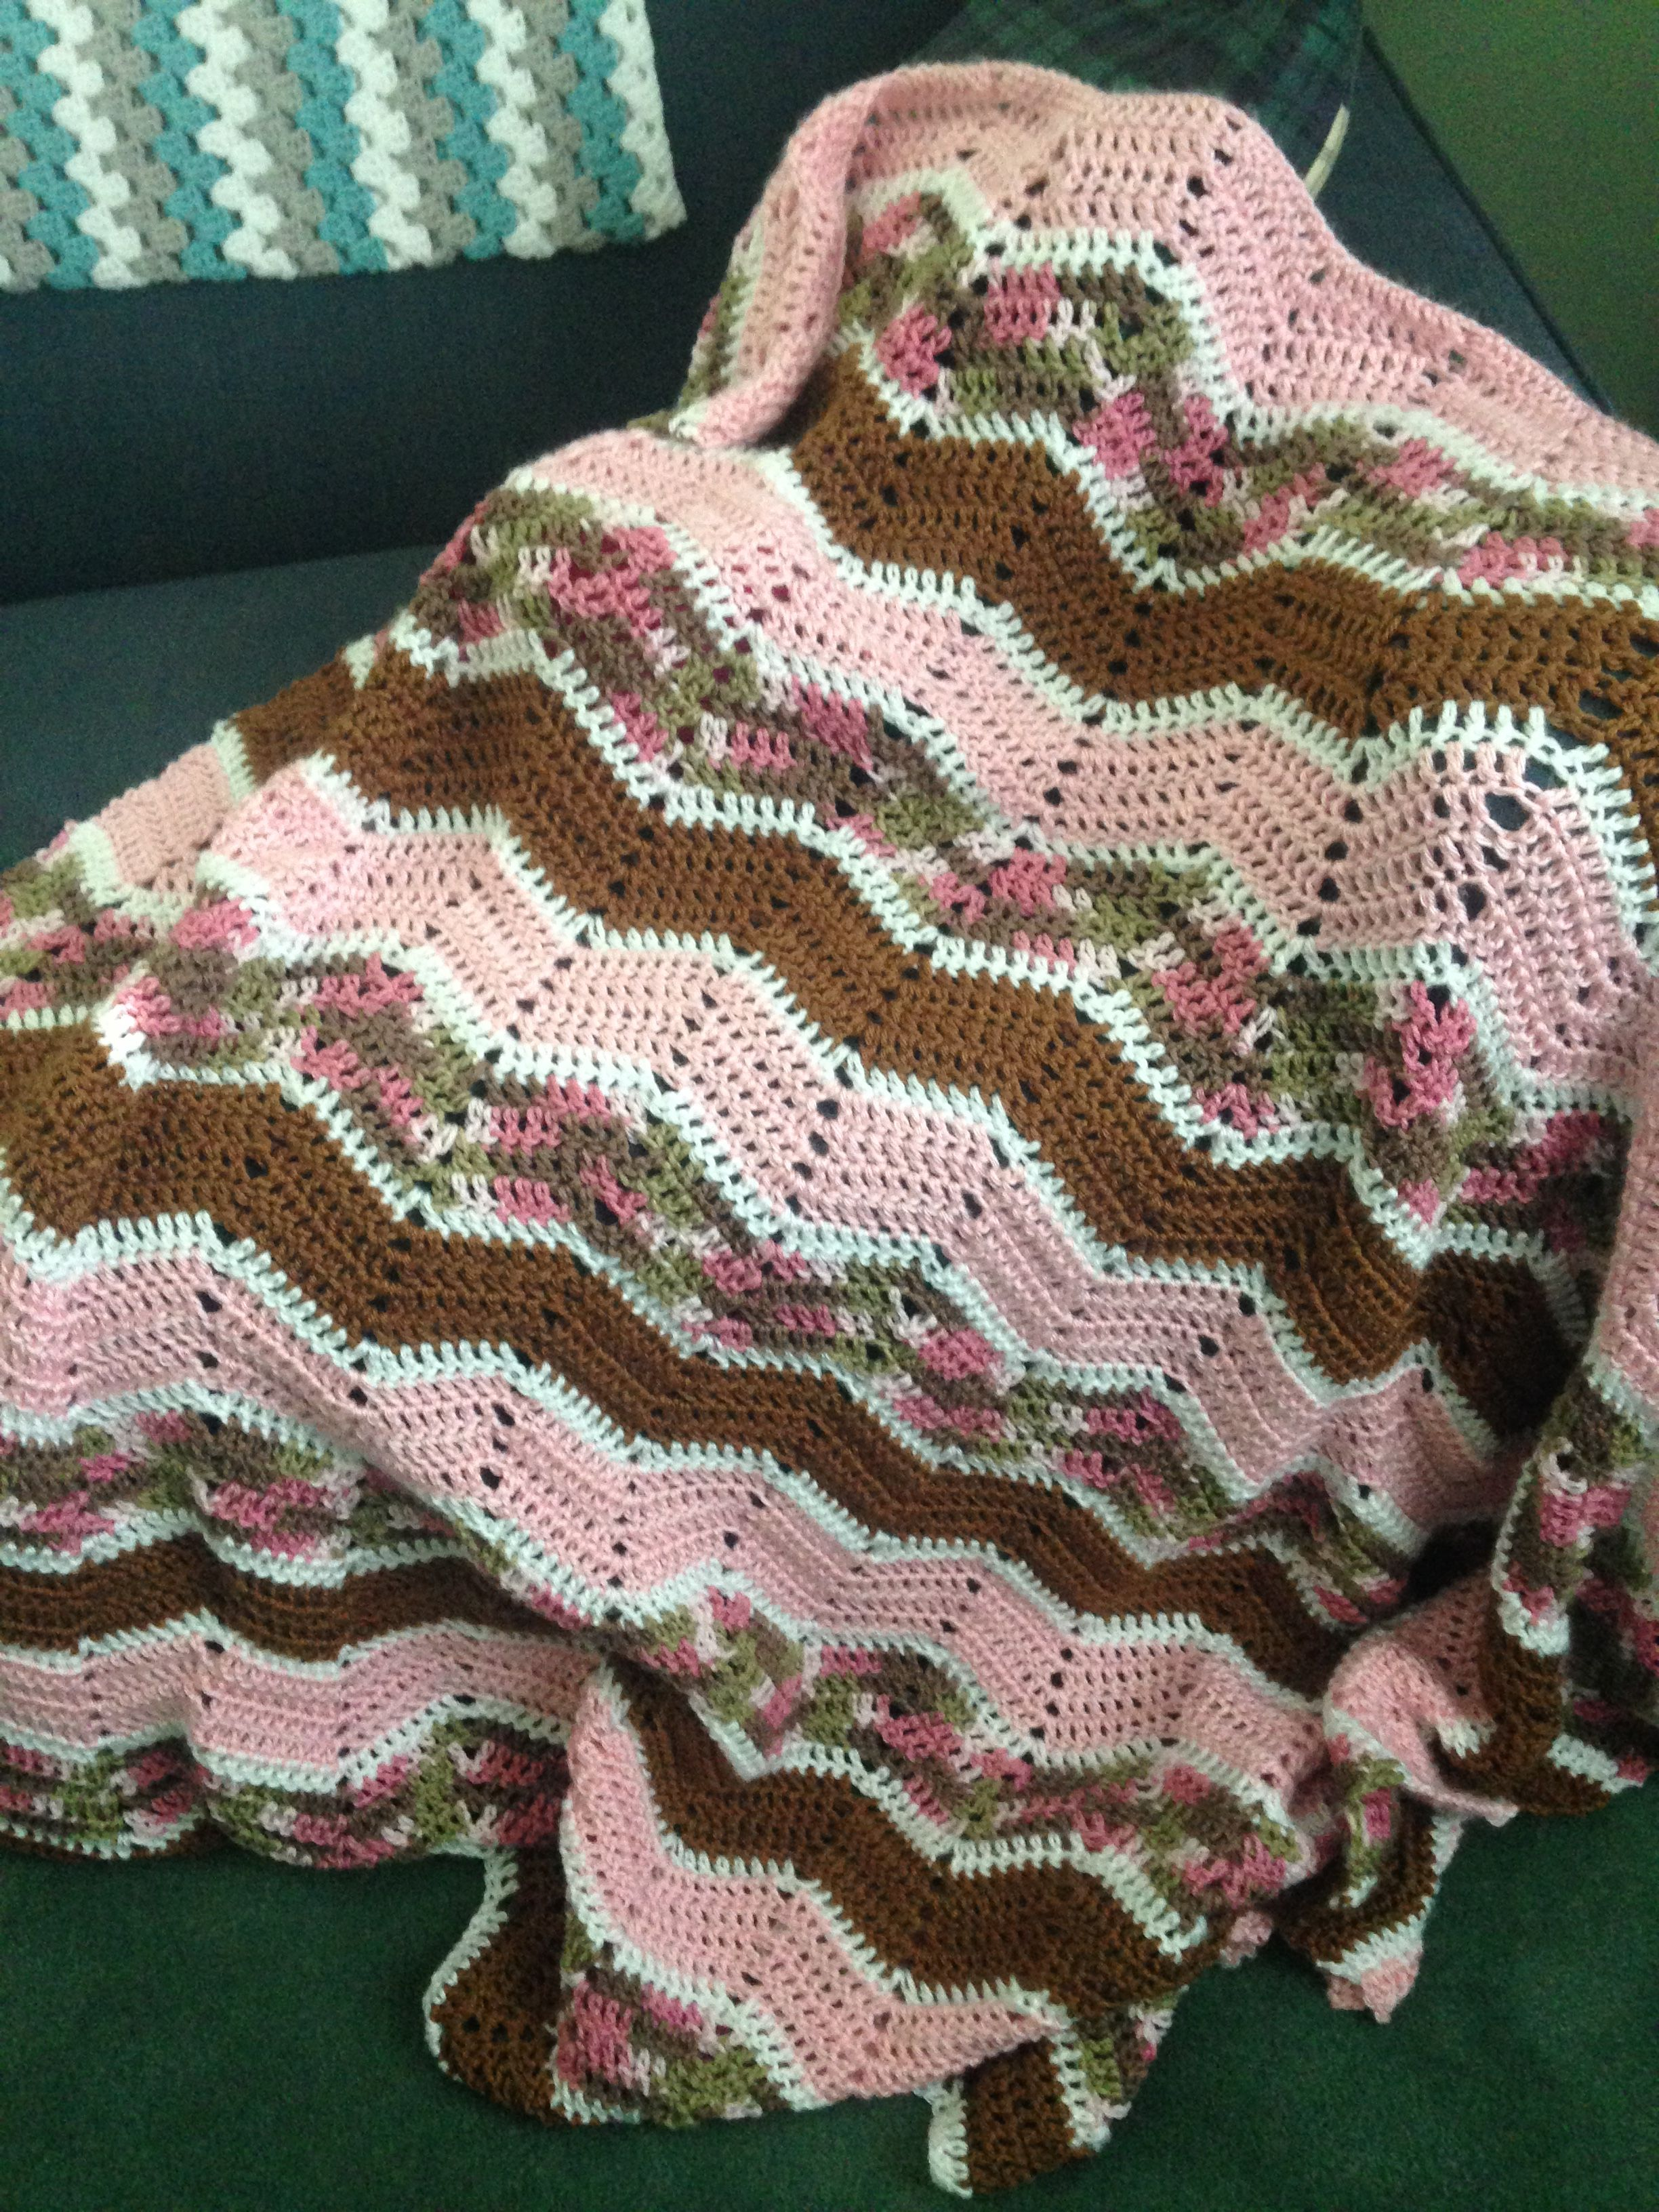 Pink camo crochet blanket | crochet | Pinterest | Manta afgana ...